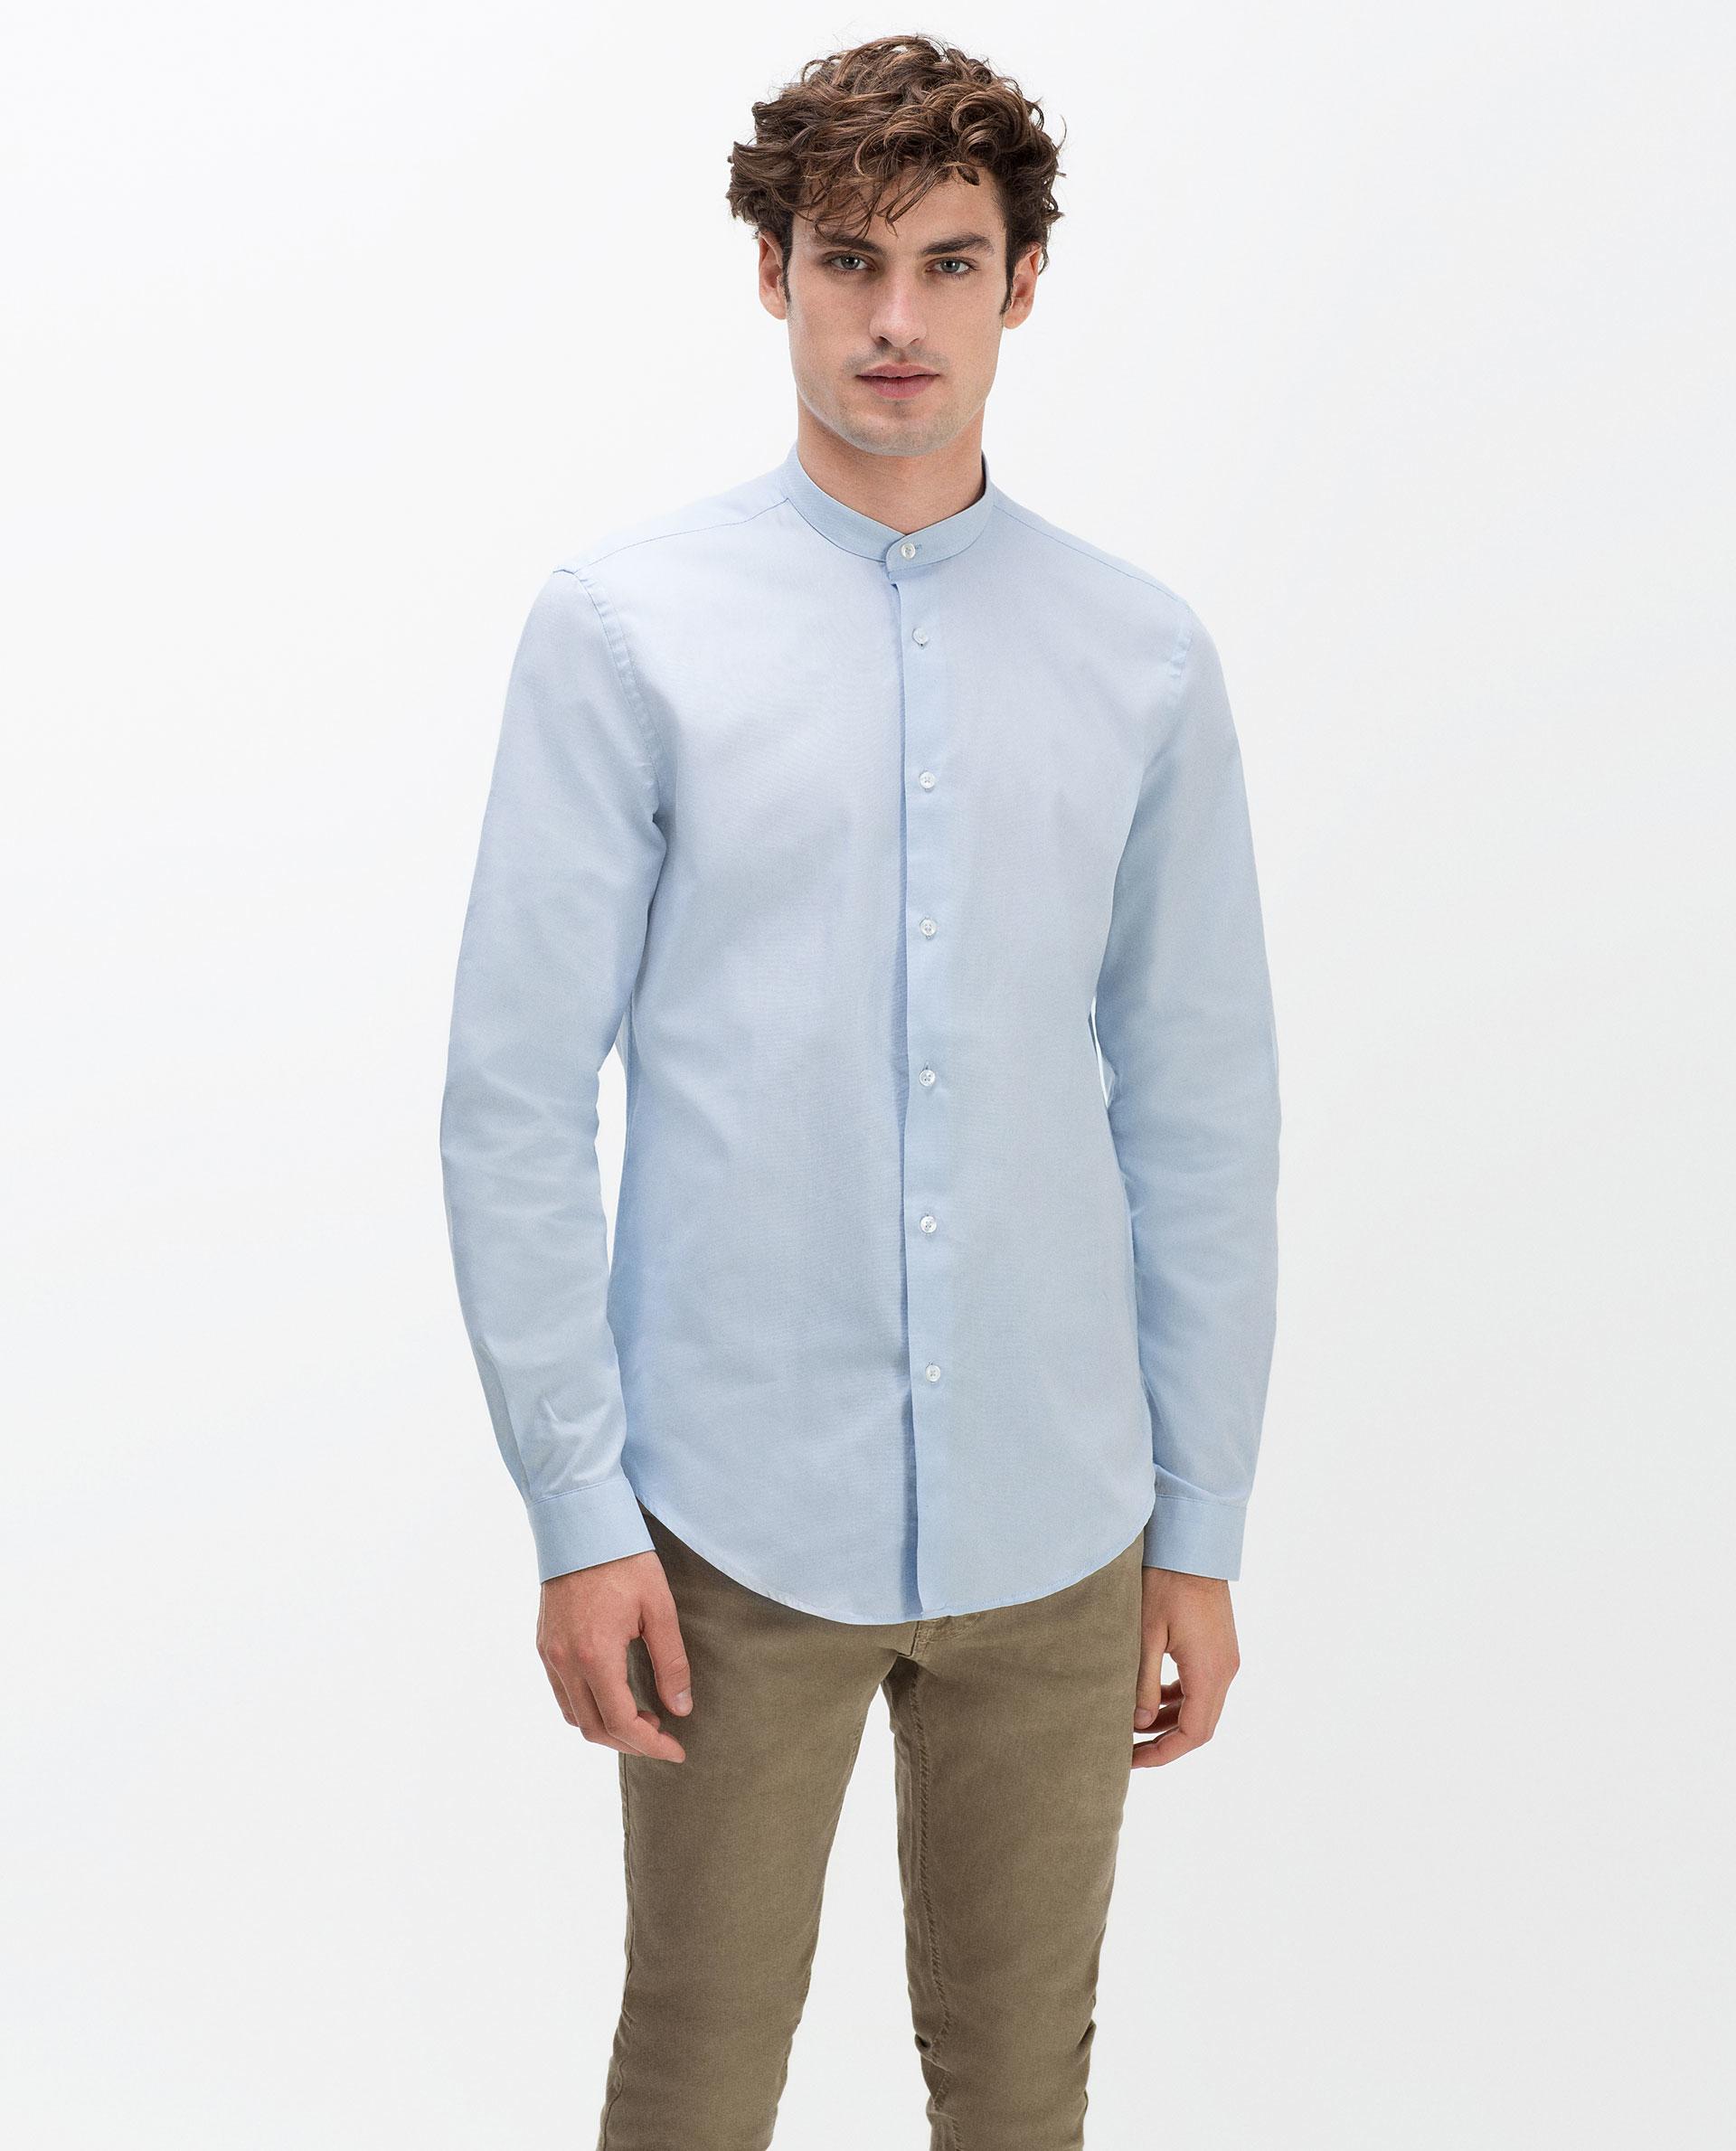 Zara Slim Fit Oxford Shirt In Blue For Men Lyst